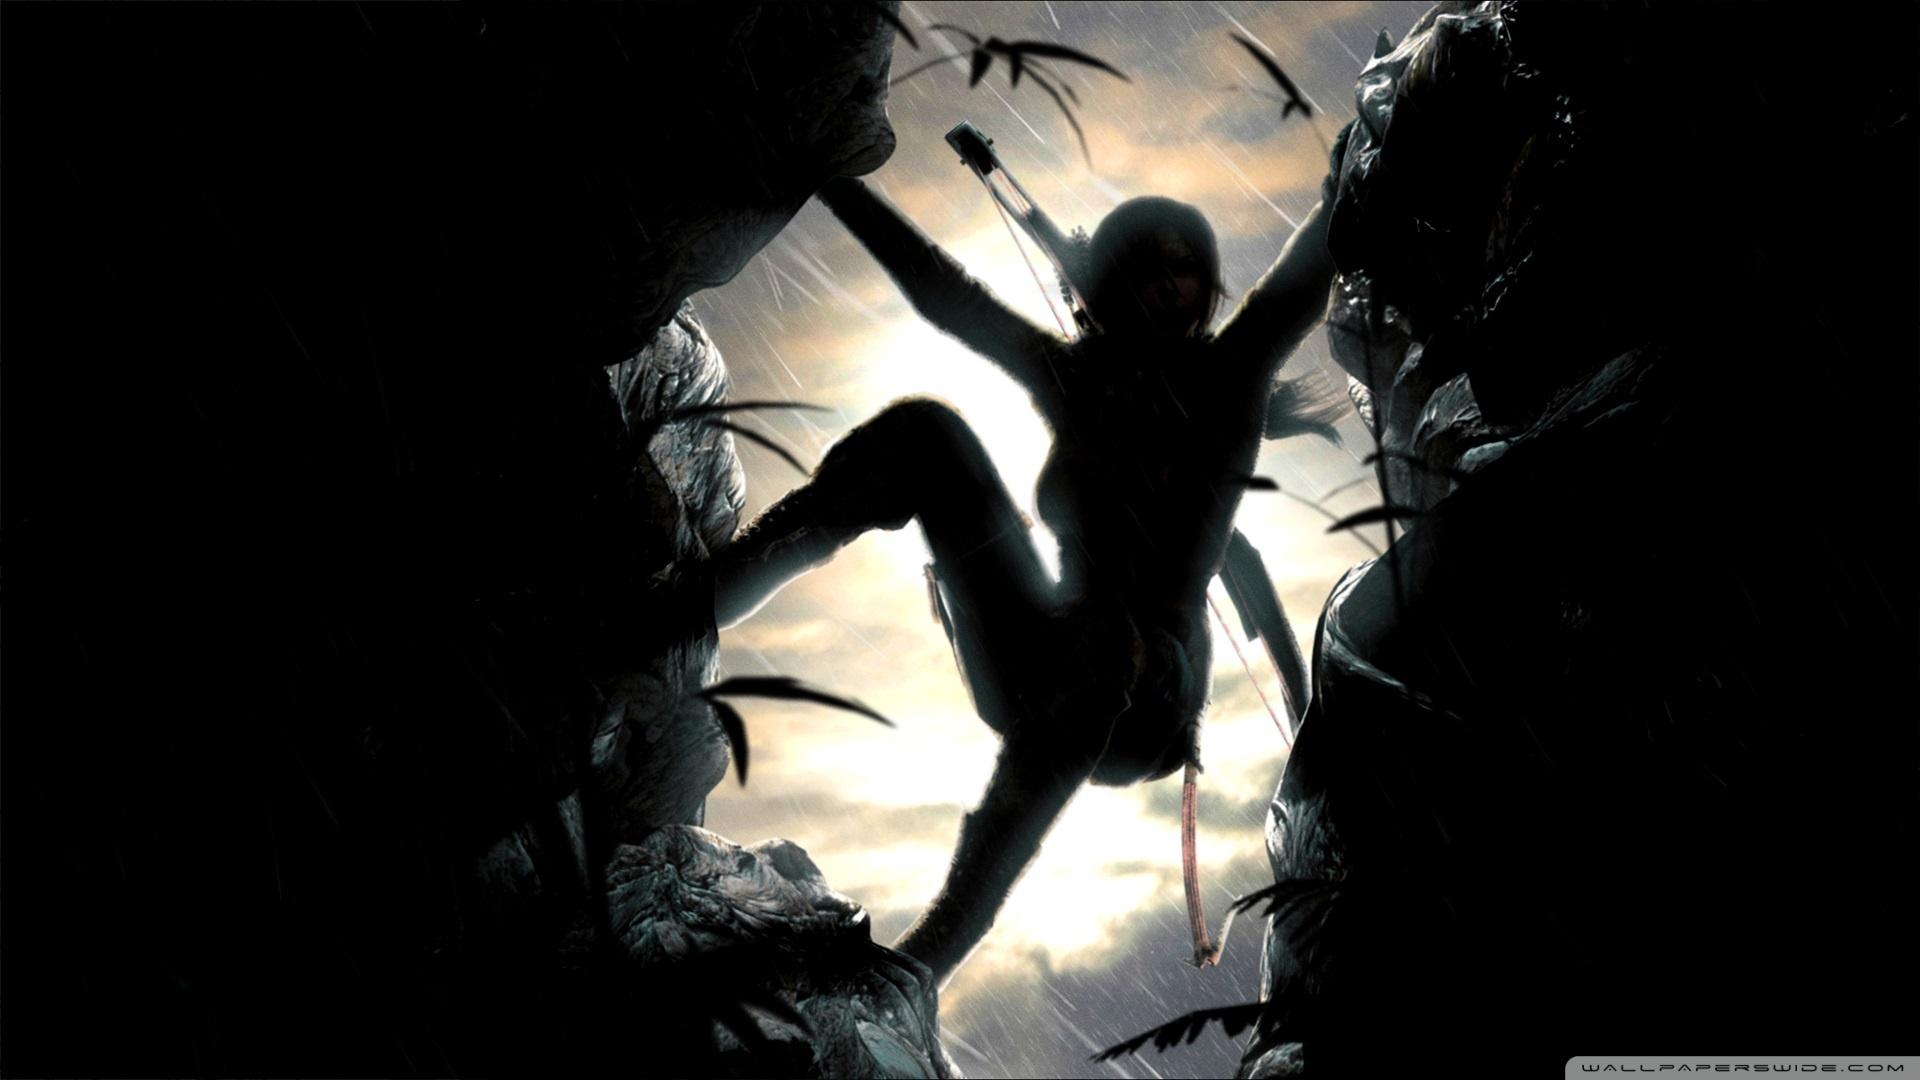 Tomb Raider Desktop Wallpaper Posted By Ryan Walker